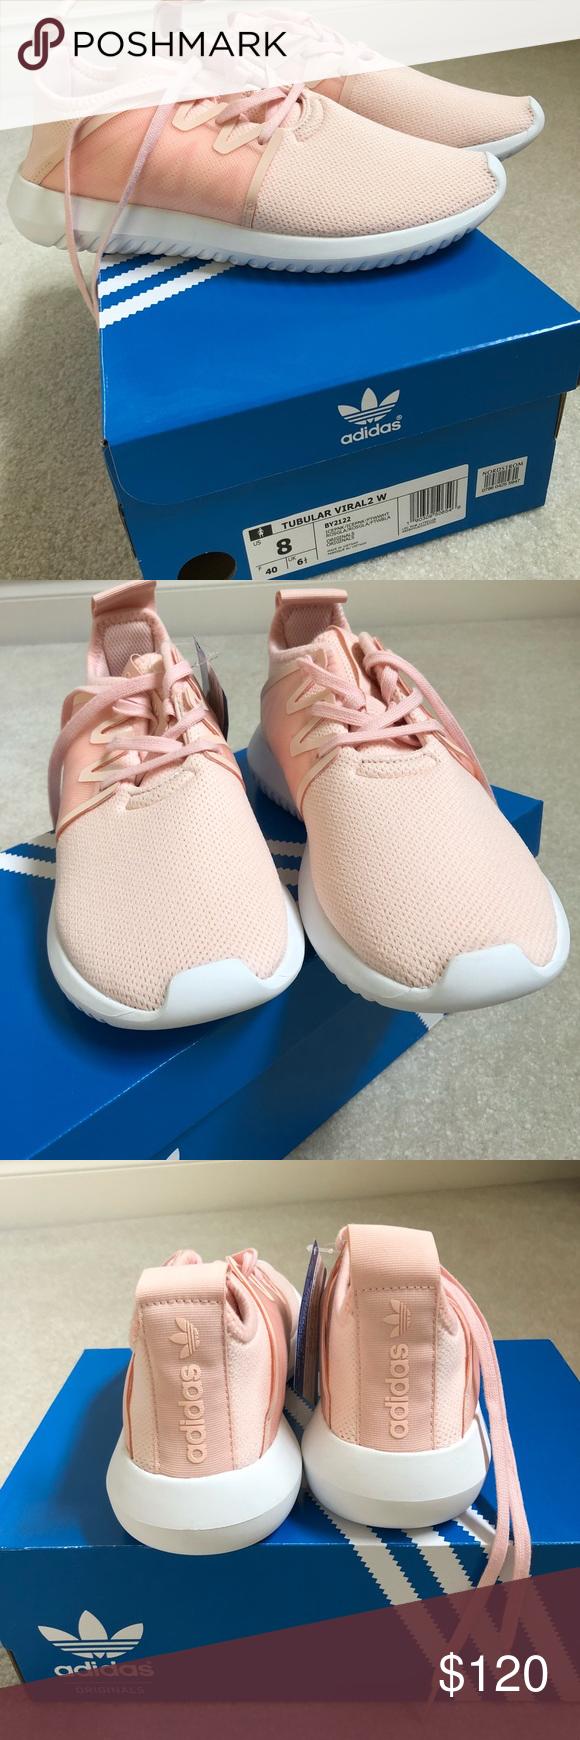 les femmes adidas marathon tr 13 flyknit chaussures / bleu jaune